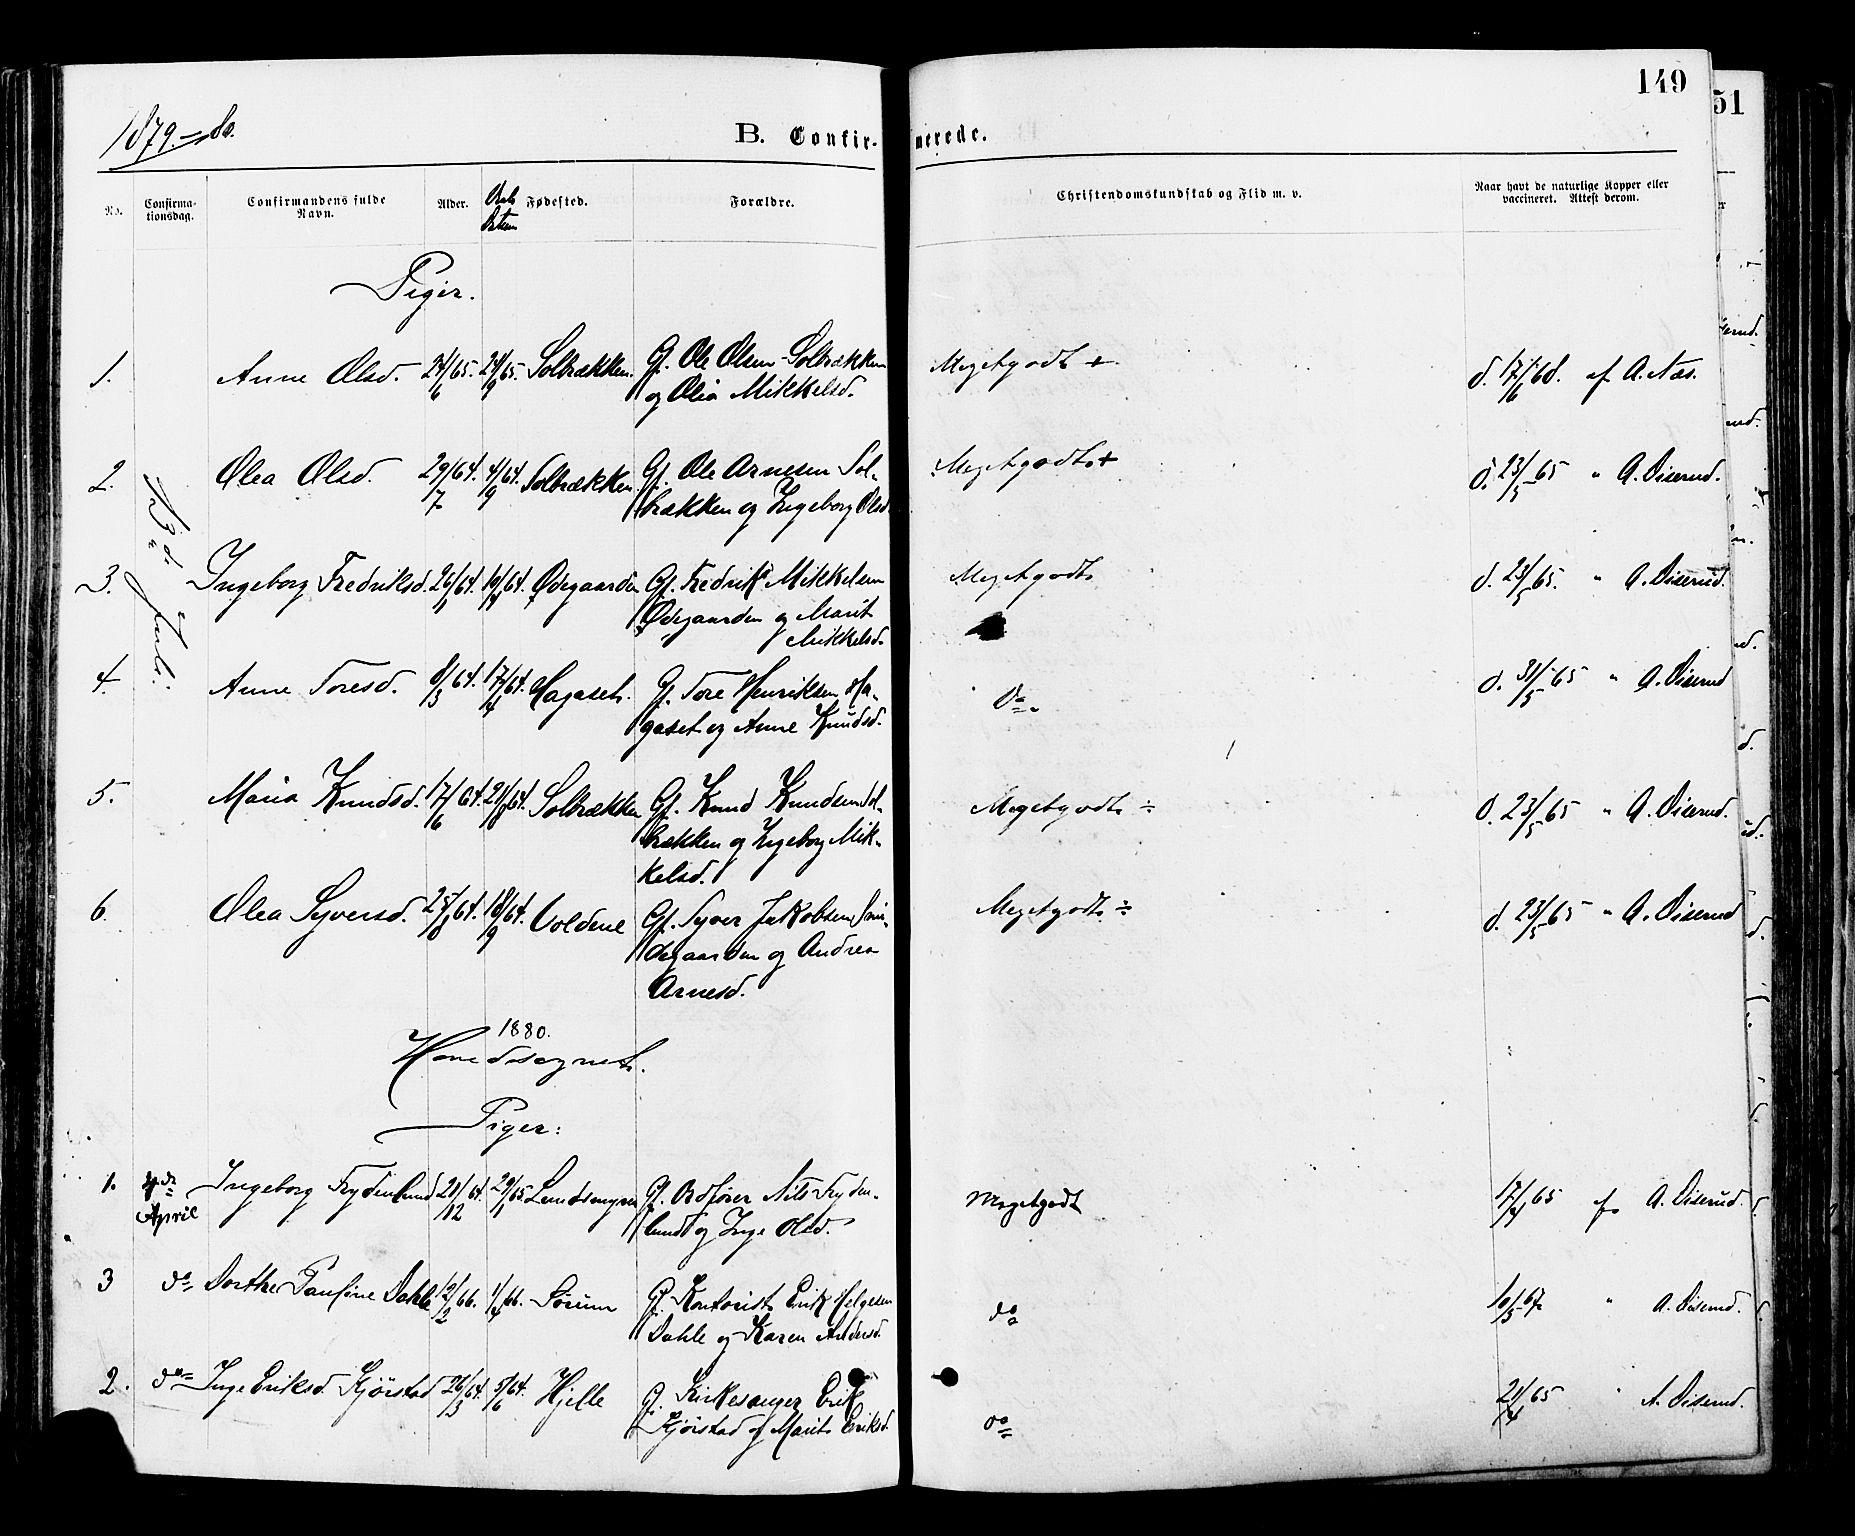 SAH, Nord-Aurdal prestekontor, Ministerialbok nr. 9, 1876-1882, s. 149